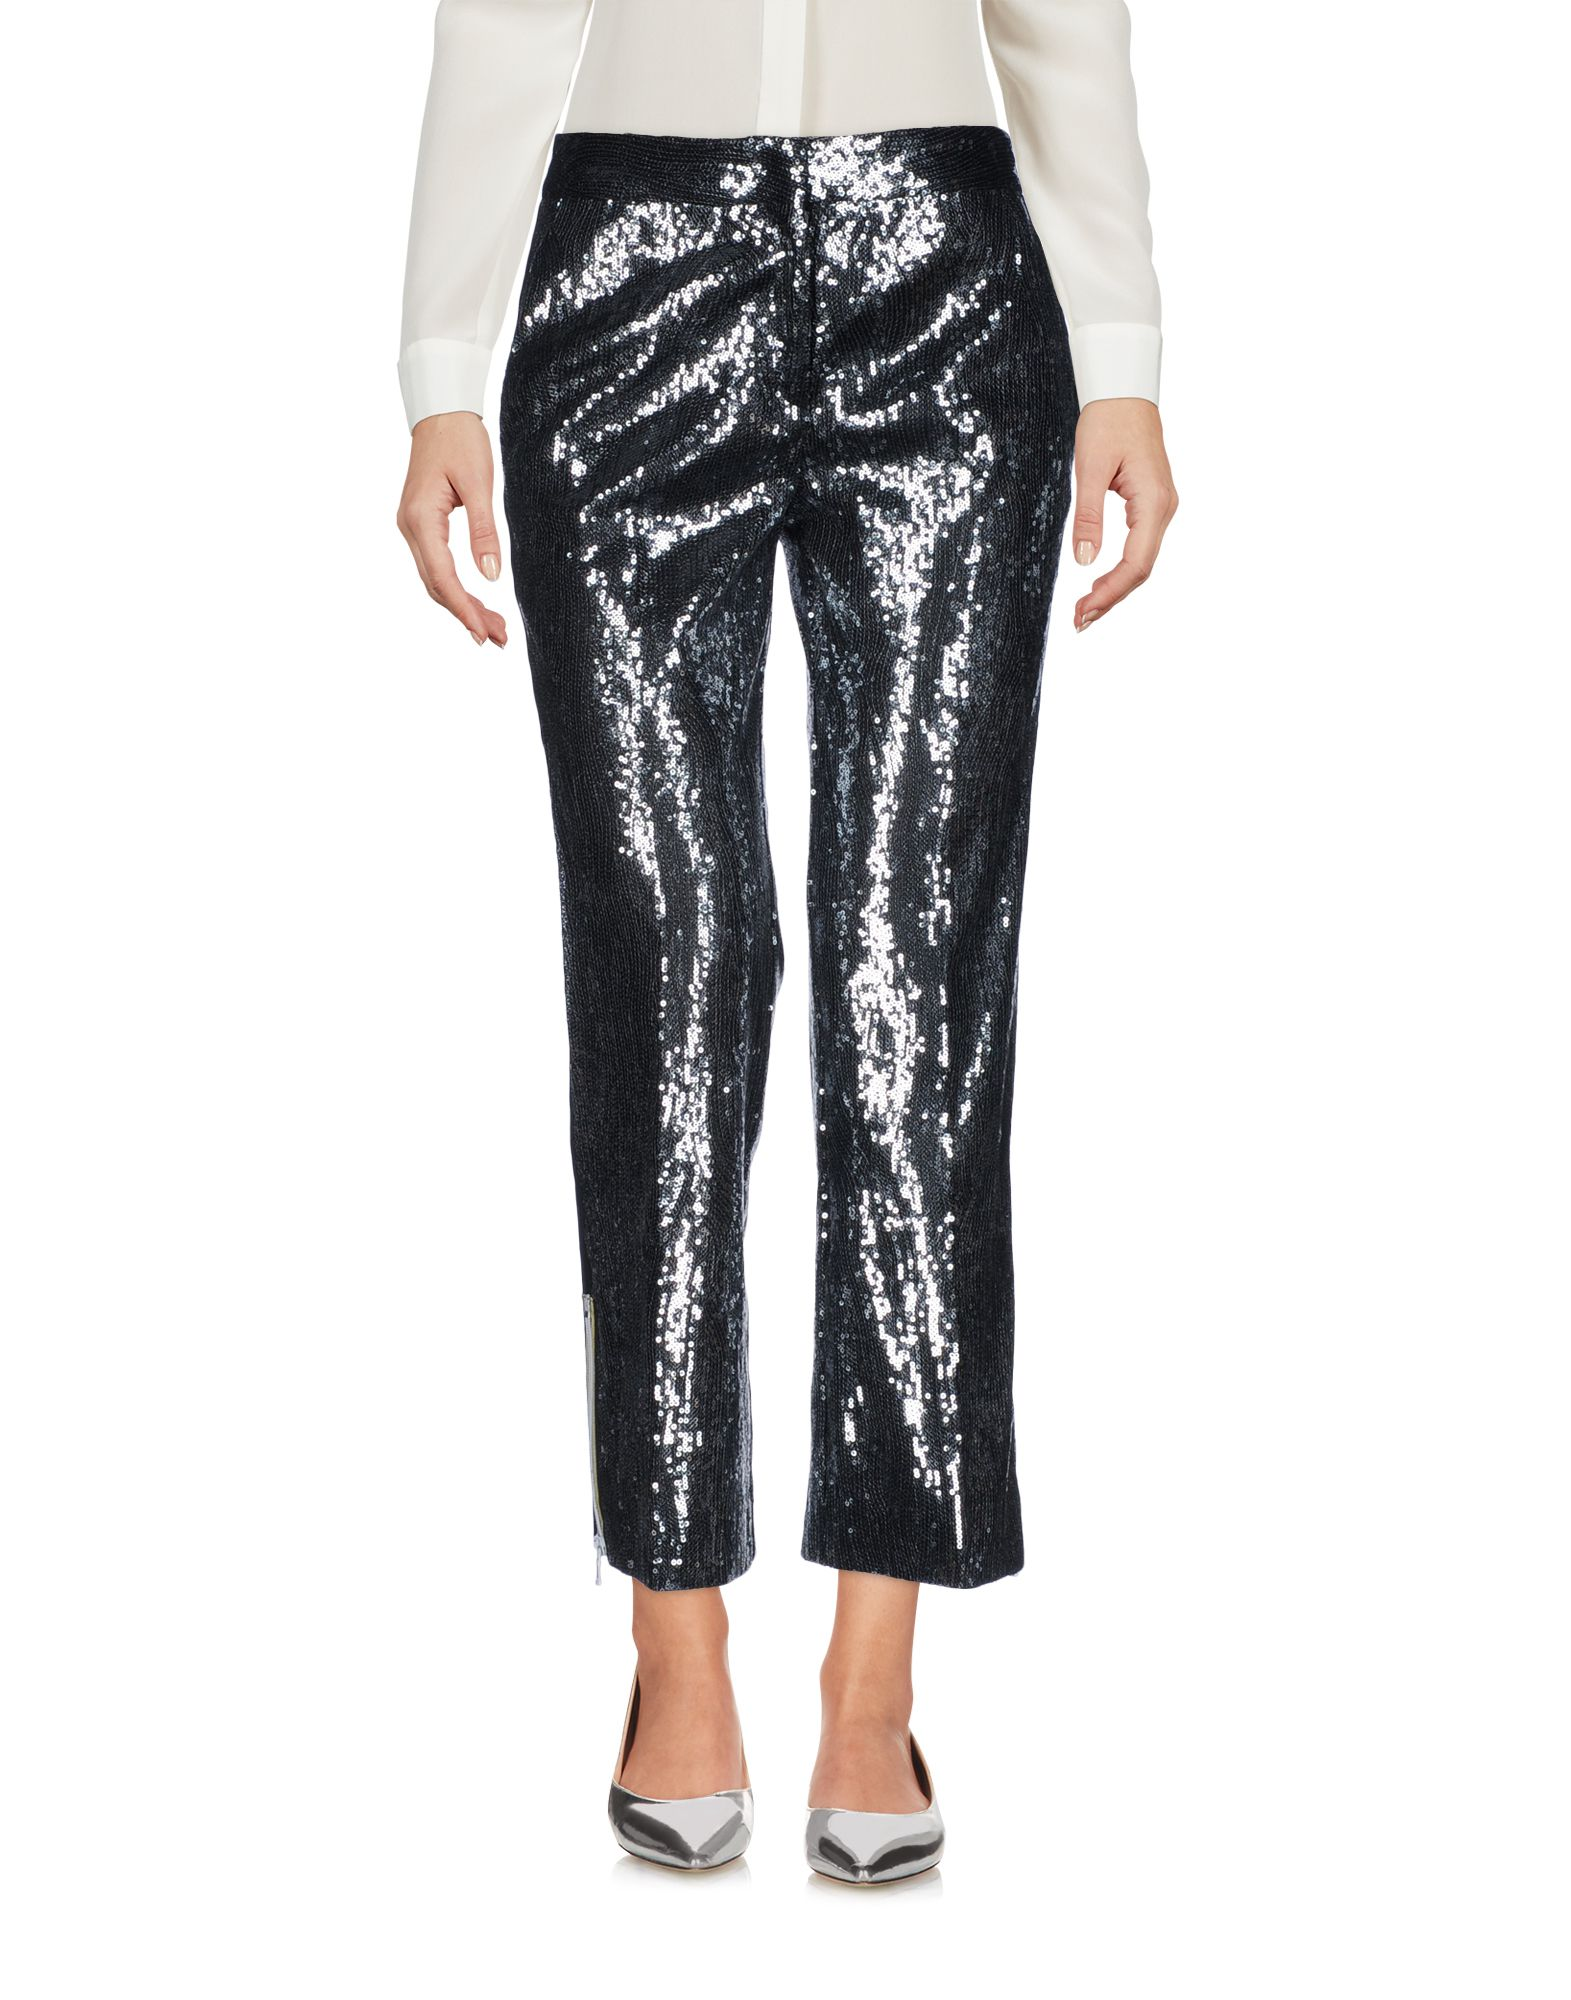 Pantalone Dritto N° 21 Donna - Acquista online su JAmL1g8fZ6